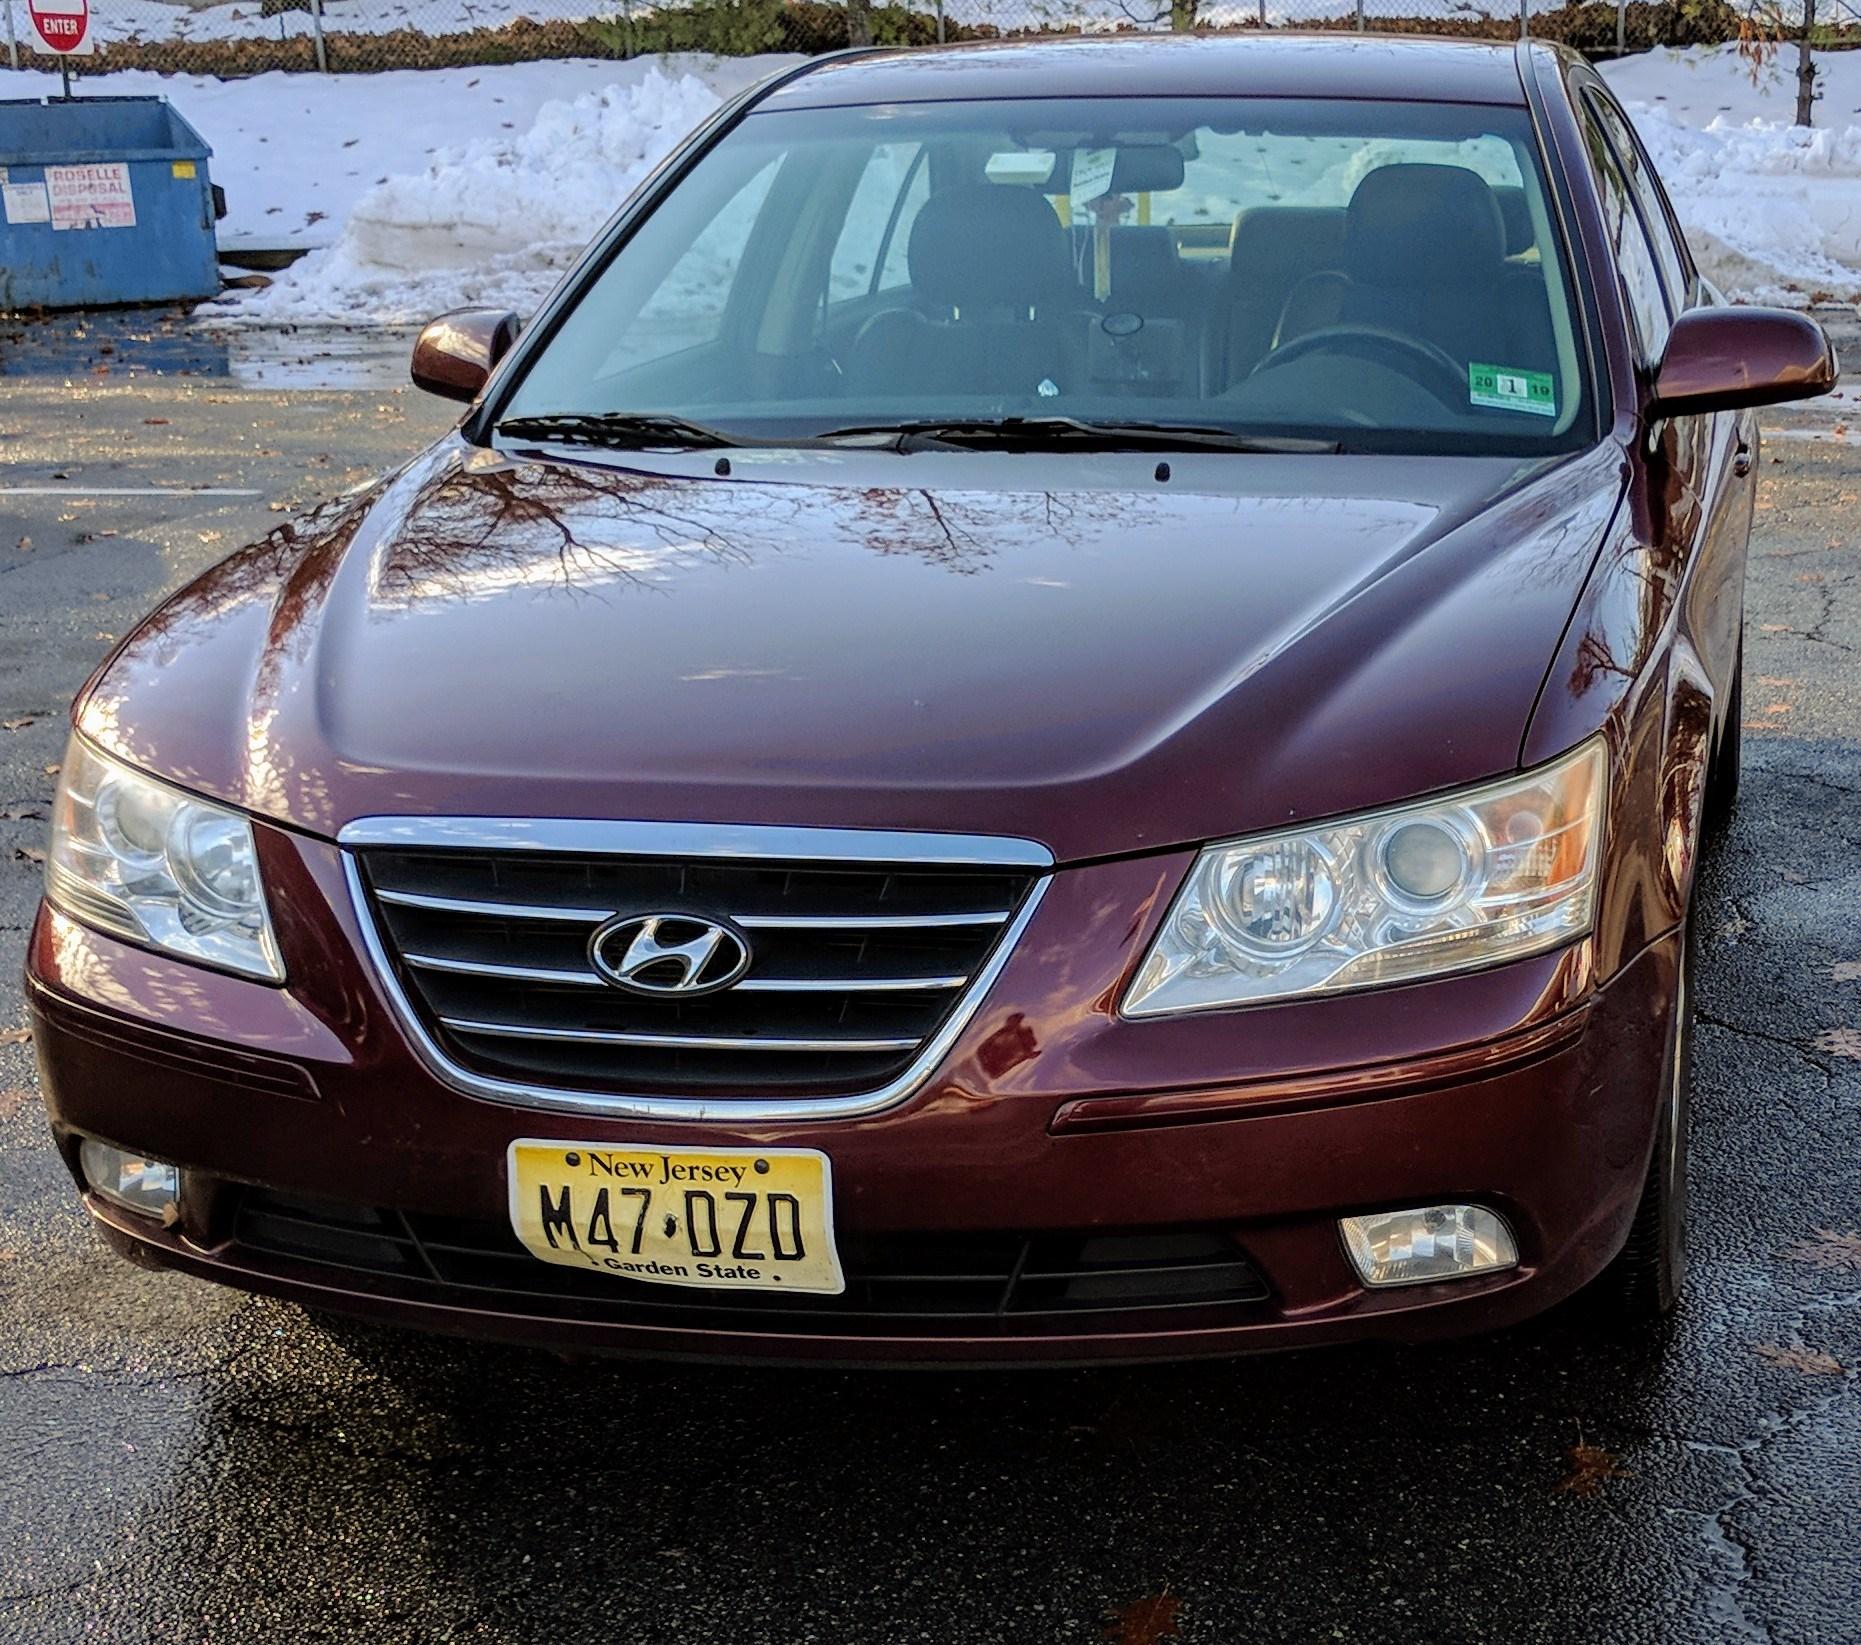 2010 Hyundai Sonata V6 Limited 100800 Miles Excellent Condition